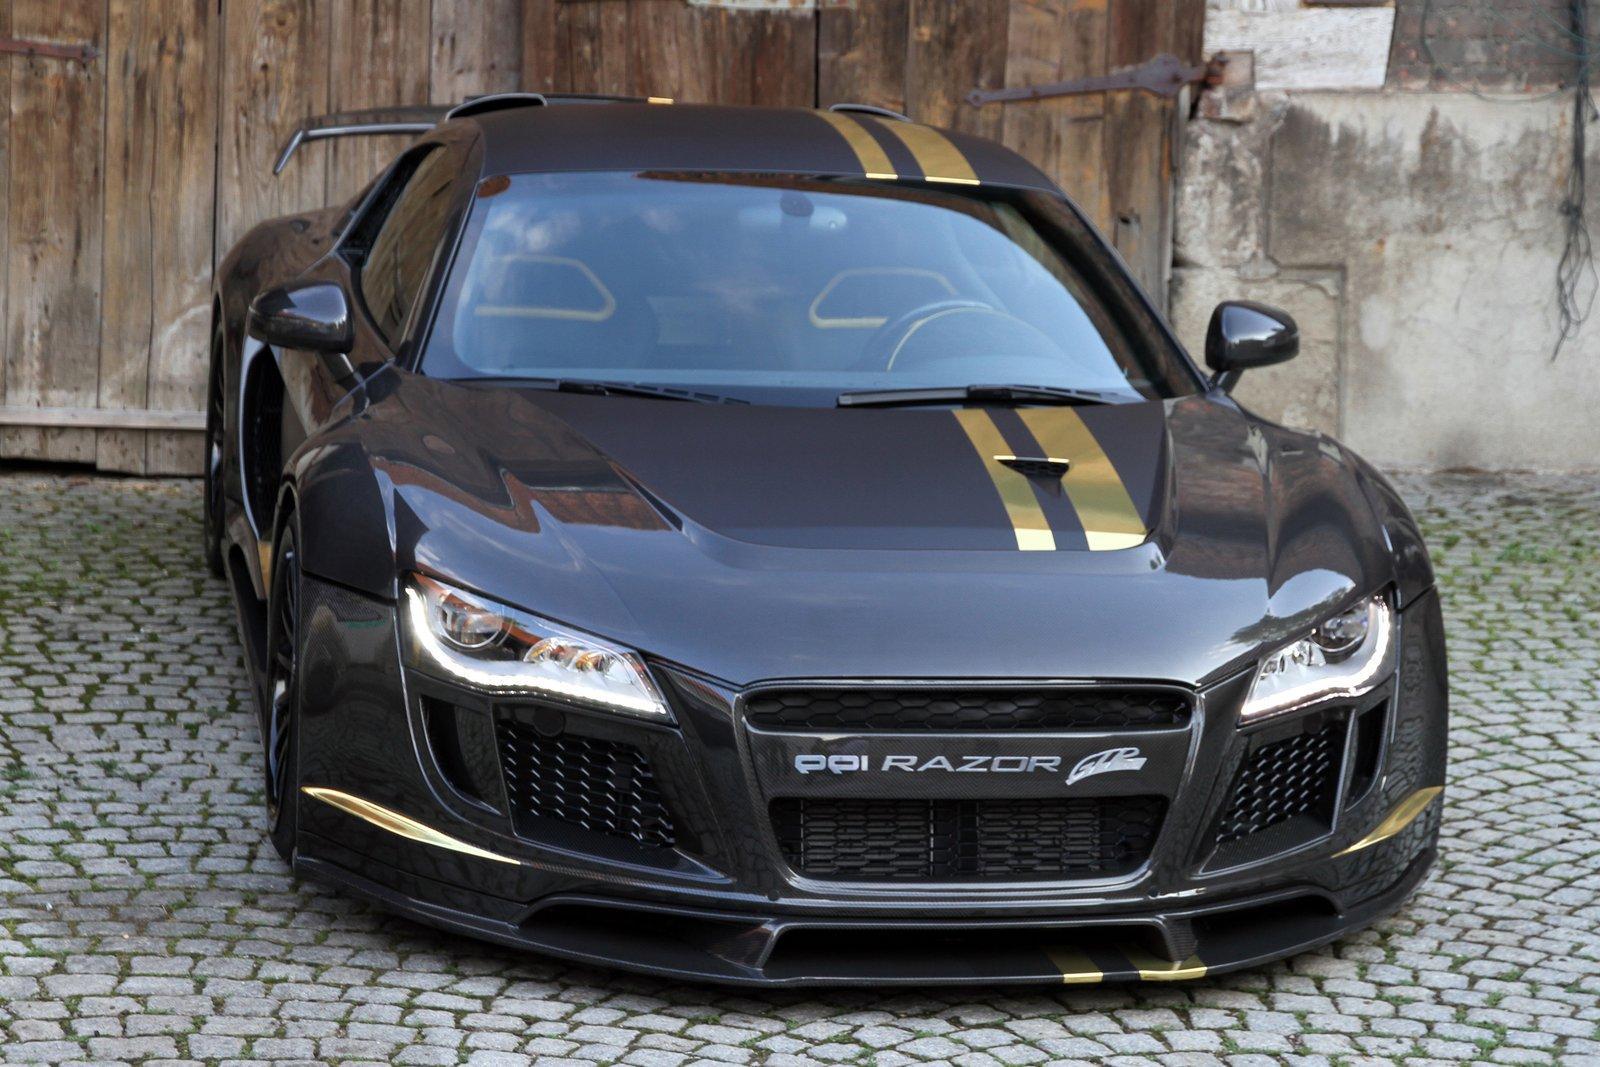 https://1.bp.blogspot.com/-_-YStLIECnk/Tgj3HLAMHJI/AAAAAAAAA6s/vaz9AlIKt0Q/s1600/PPI+GTR-10+Limited+Edition+Audi+R8+2.jpg